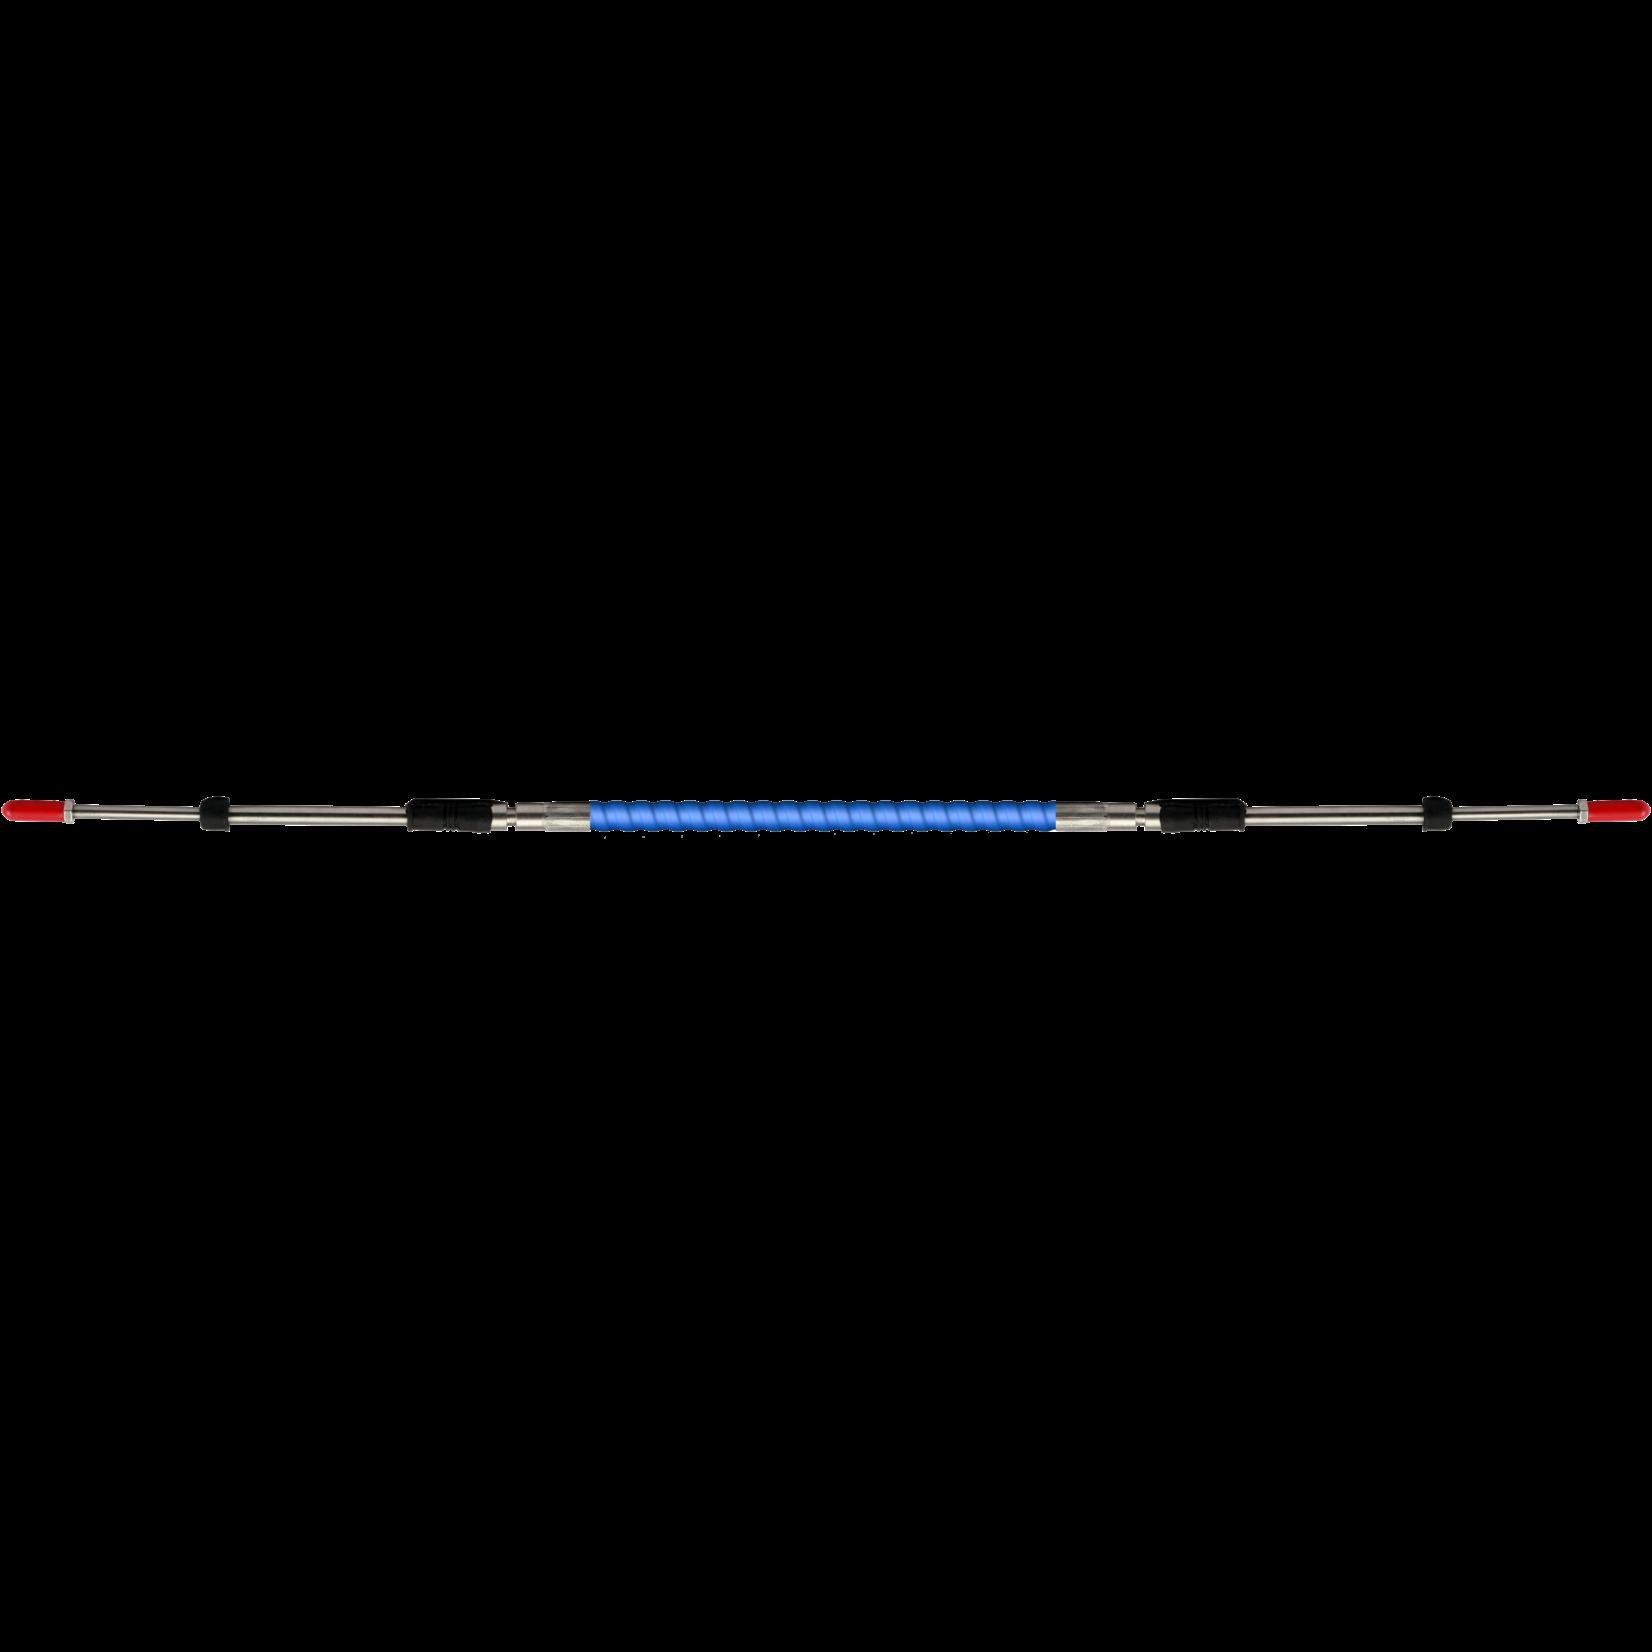 Multiflex Marine  EDGE Engine Control Cable - Universal